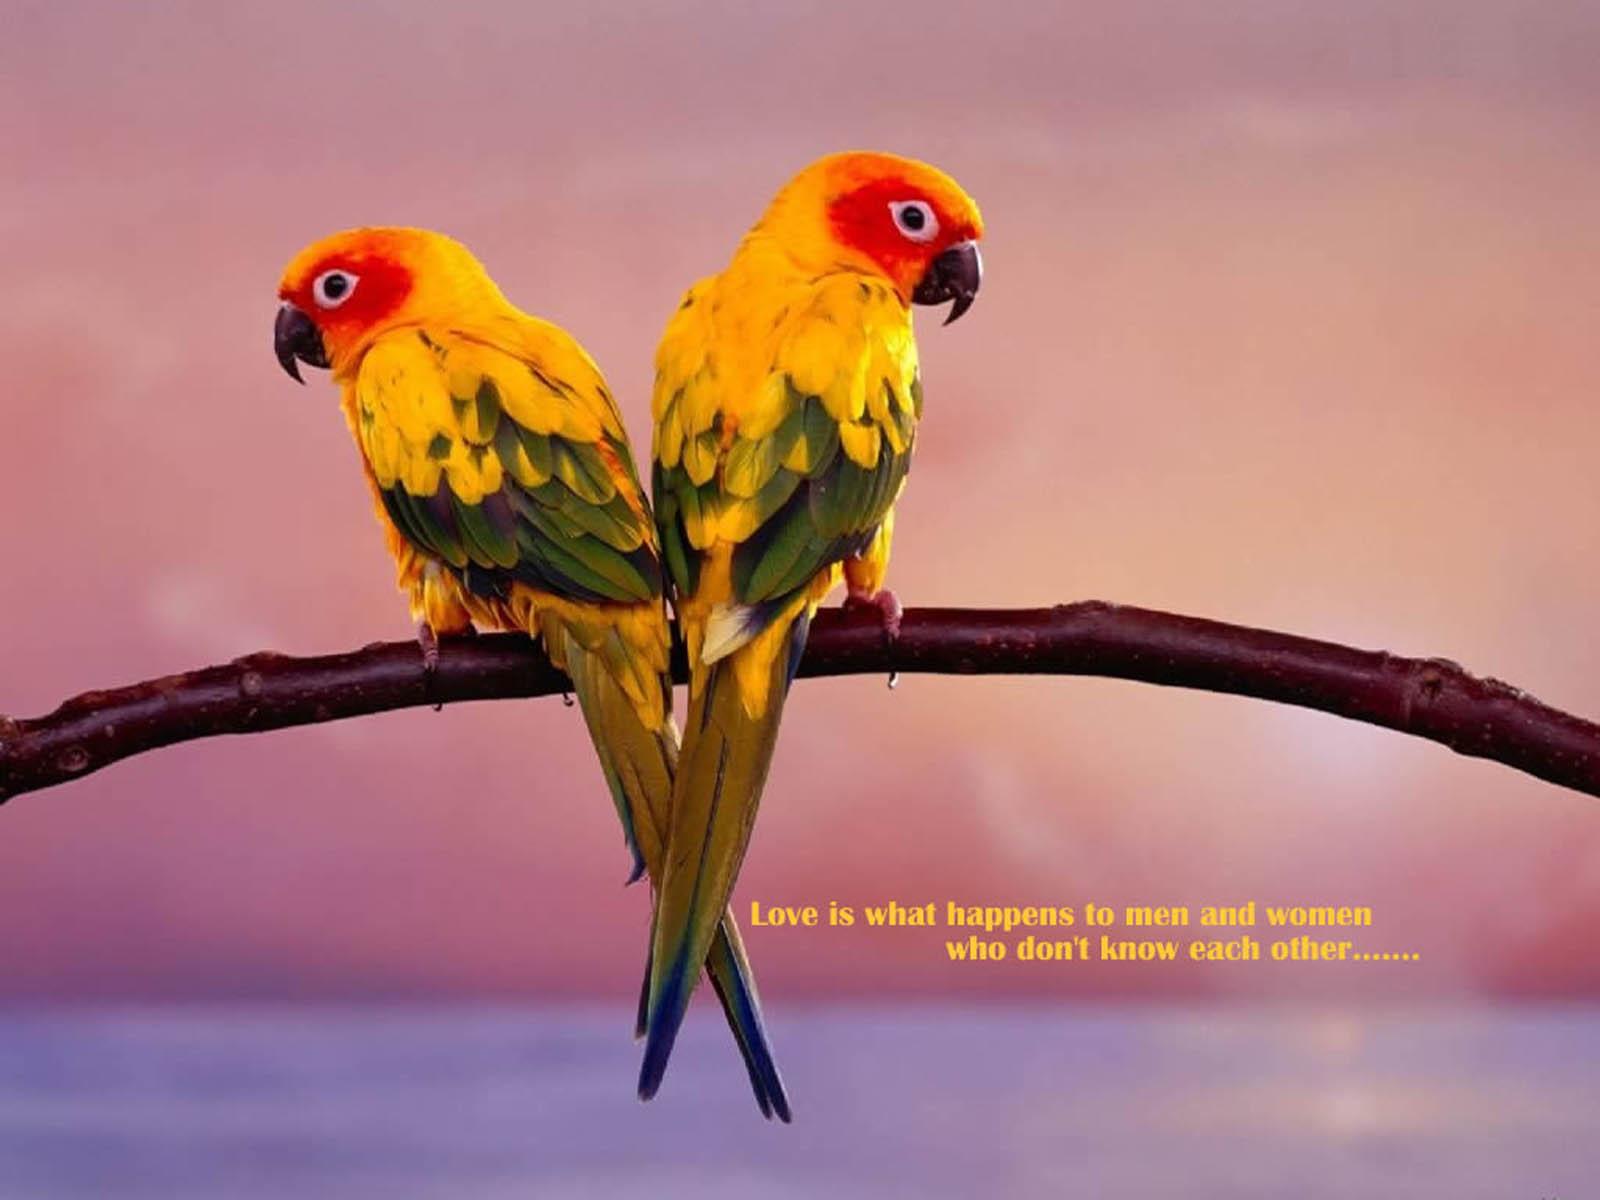 mp3 download free forever: birds falcon wallpaper 1920x1080 birds